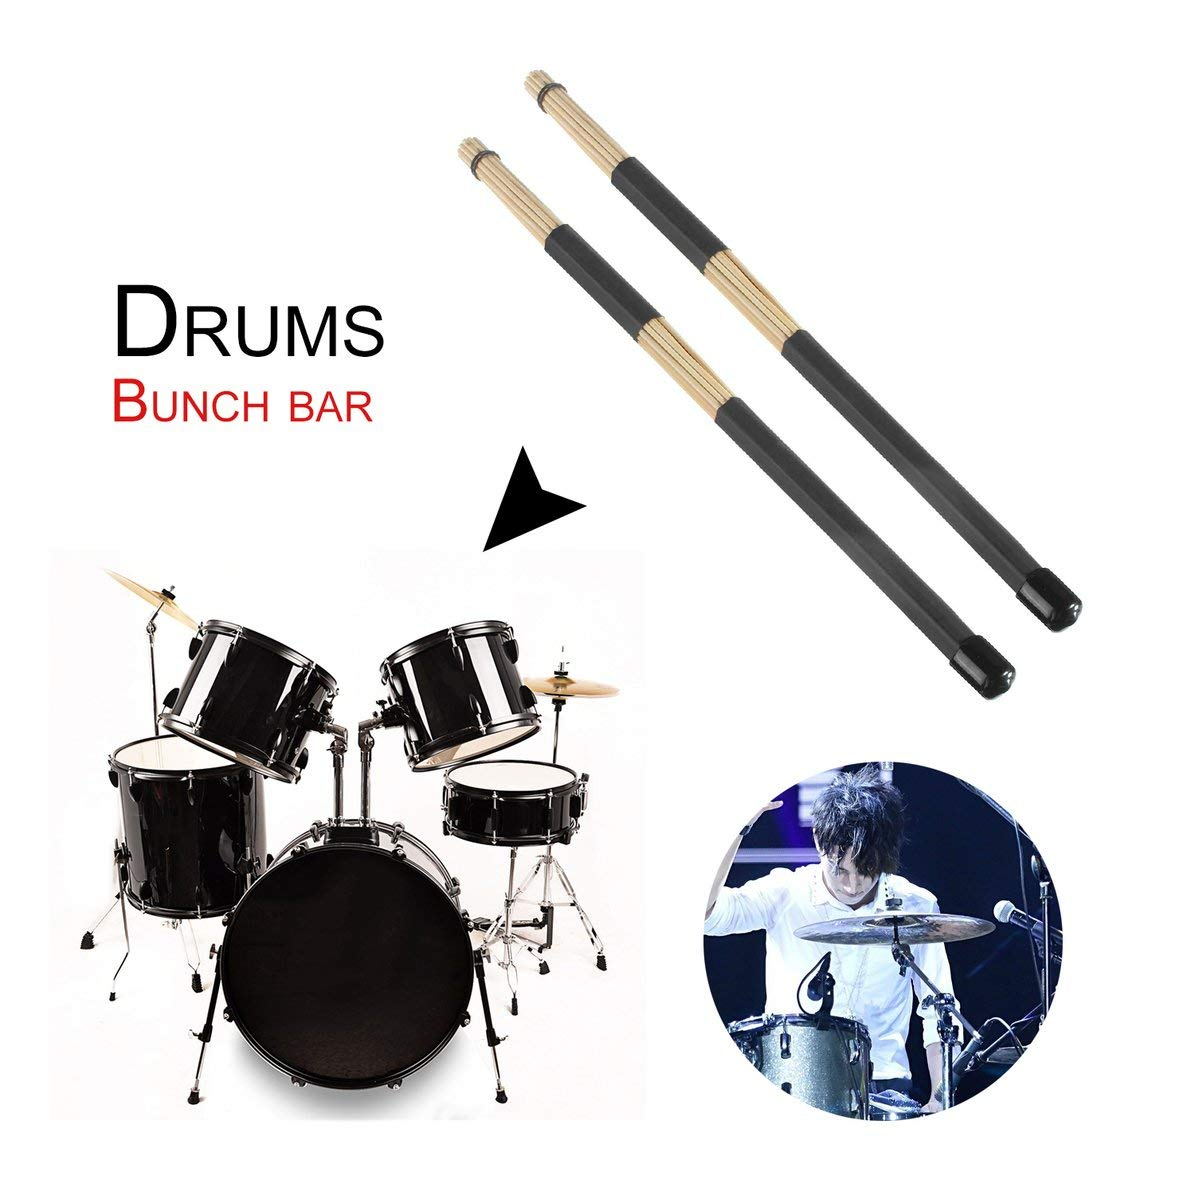 Rojo, WEIWEITOE 1 par de Madera de bamb/ú Profesional Multi-Sticks Jazz Drum Rods Sticks Pinceles Baquetas Drum Accesorios con Mango de Goma